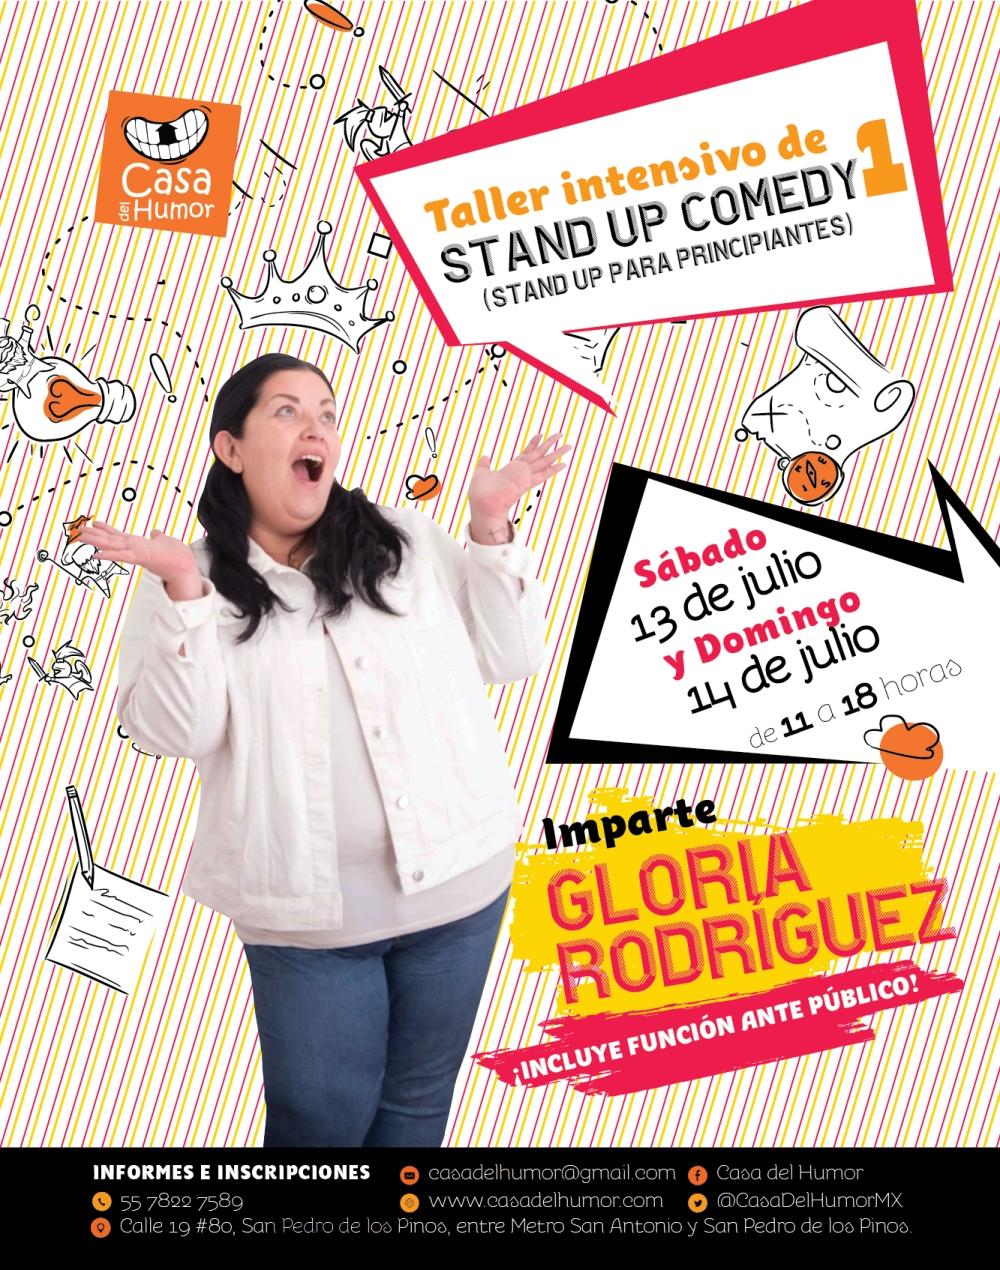 Casa_del_humor_standup_intensivo_gloria_rdgz-01